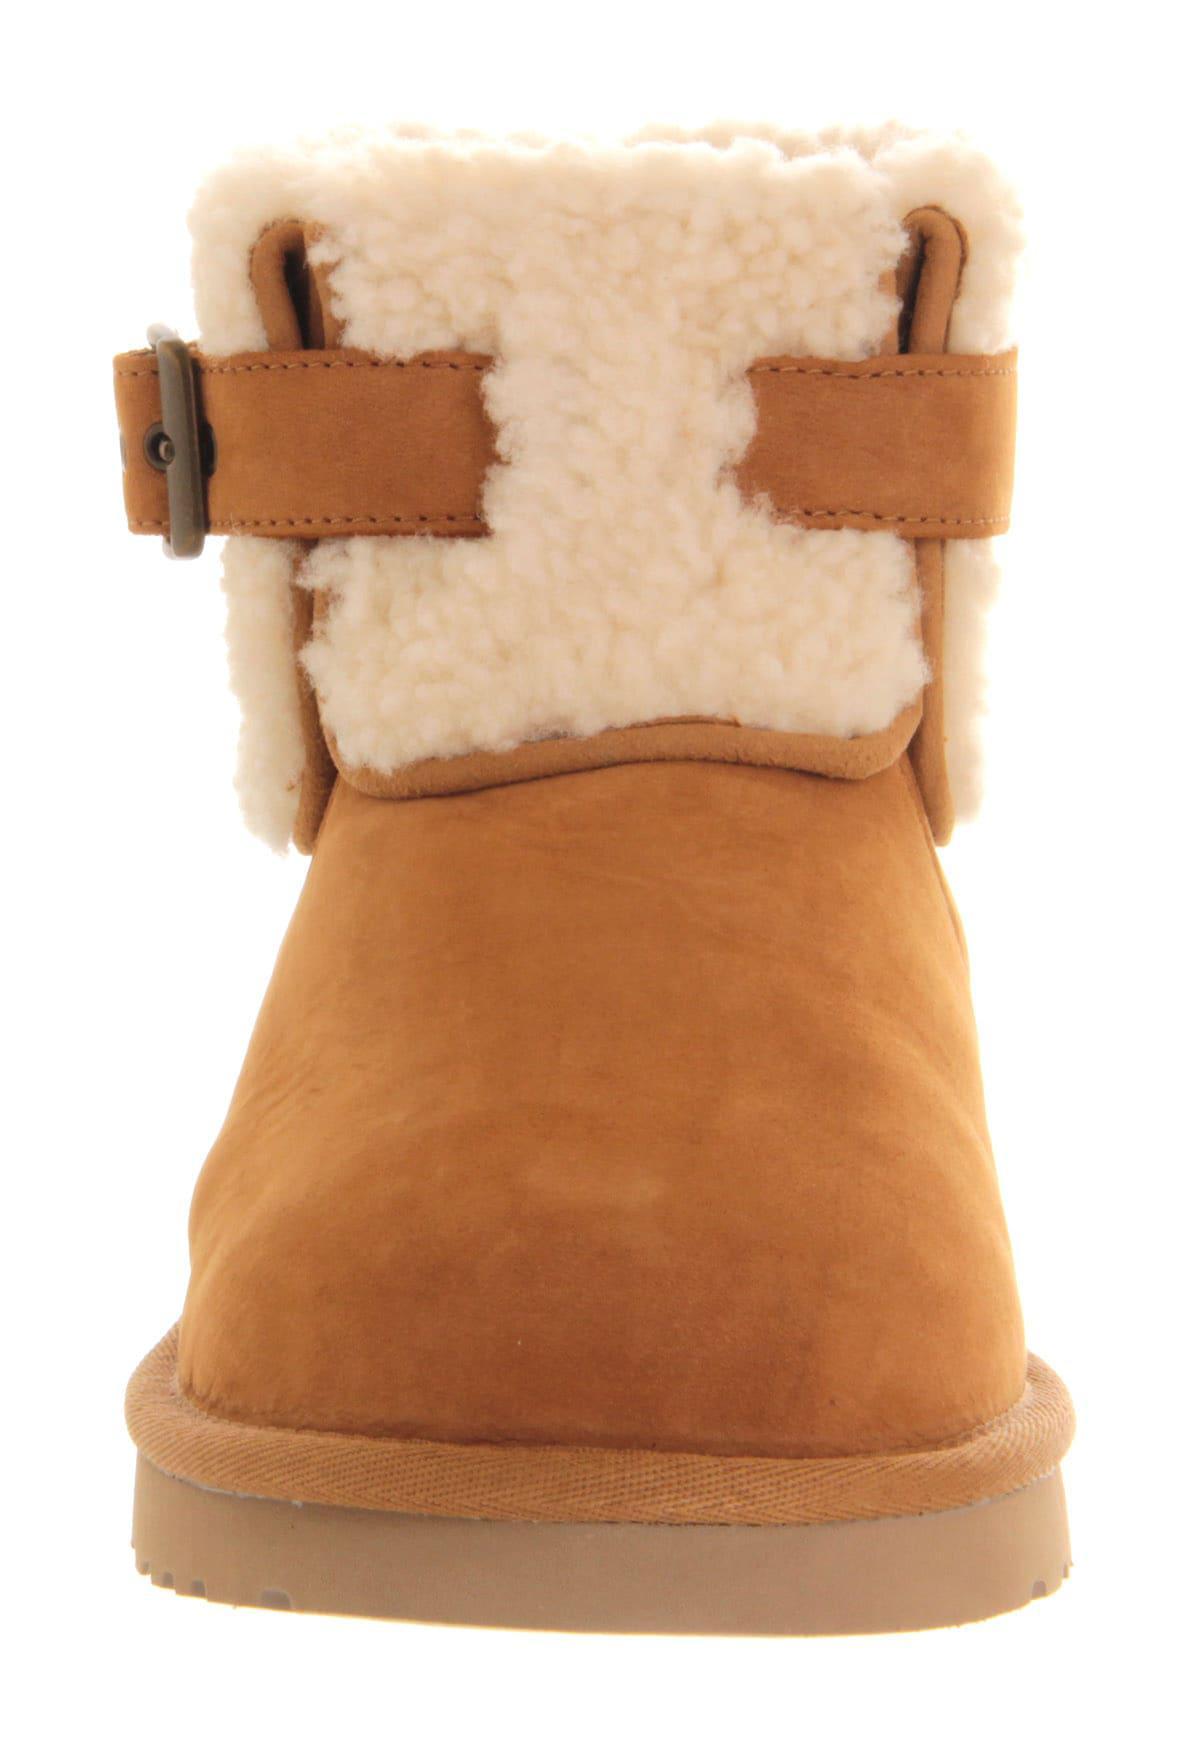 Lyst - Ugg Jocelin Short Suede Boots